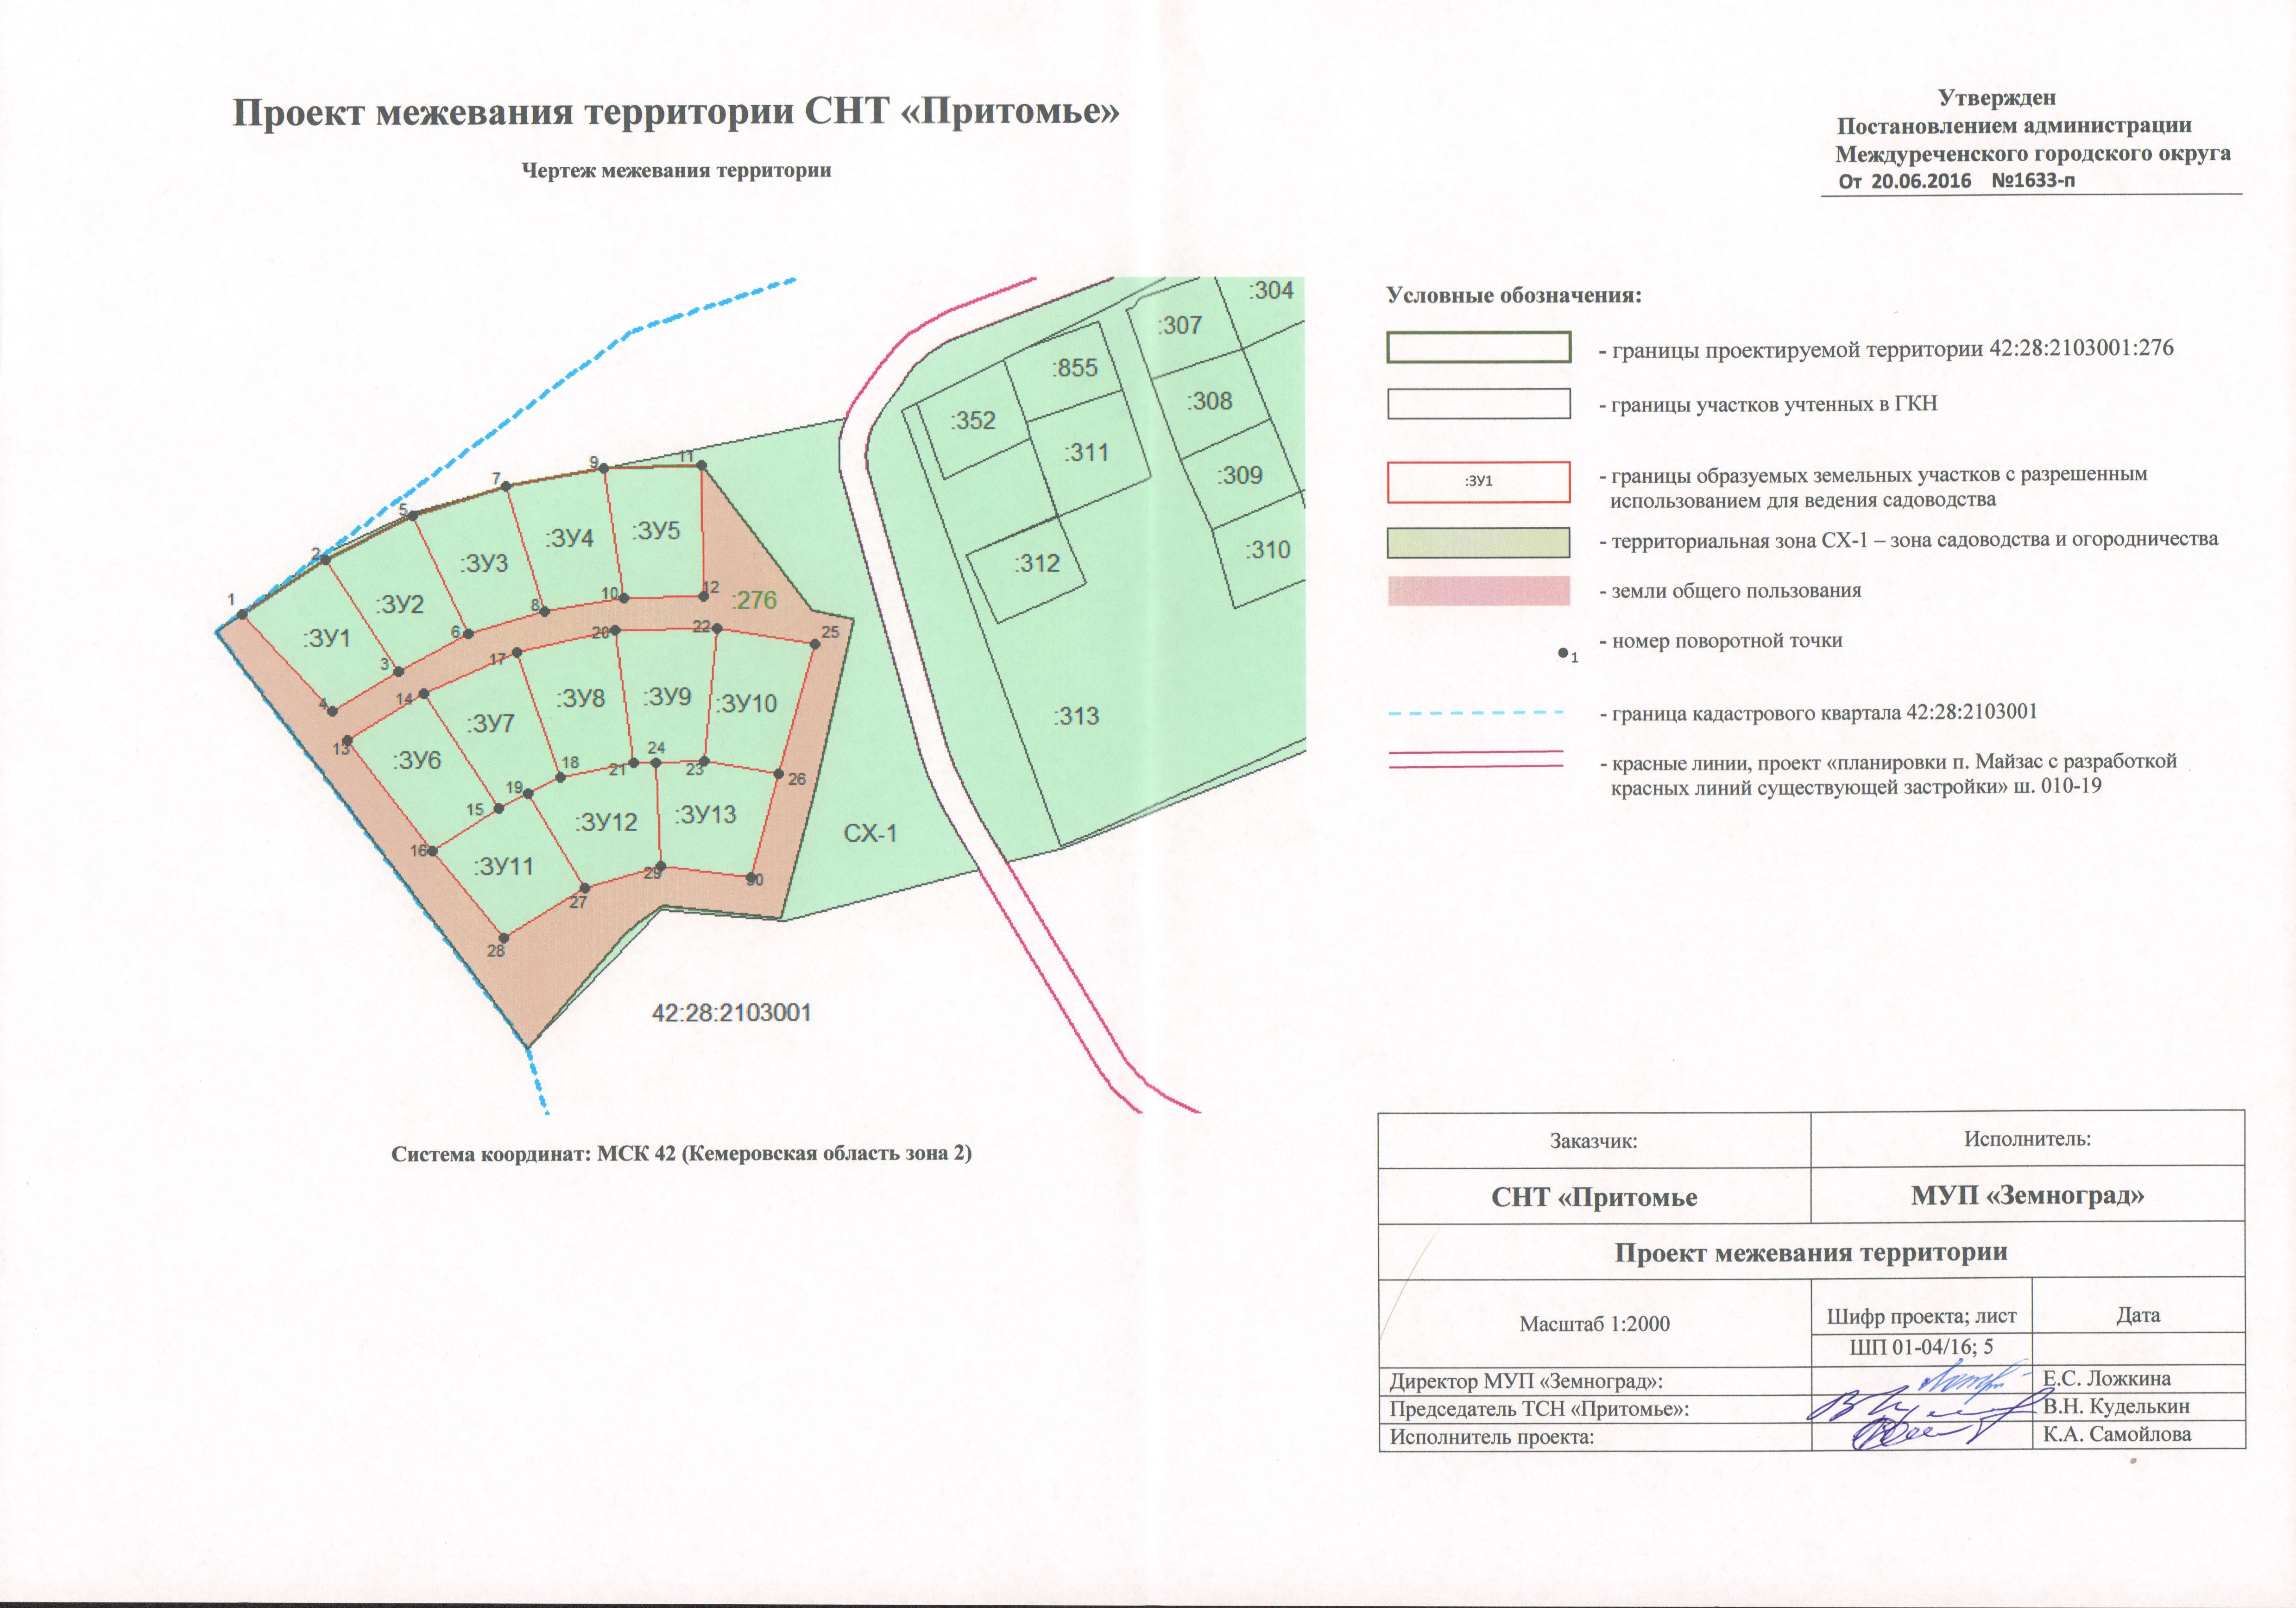 Особенности проекта межевания территории